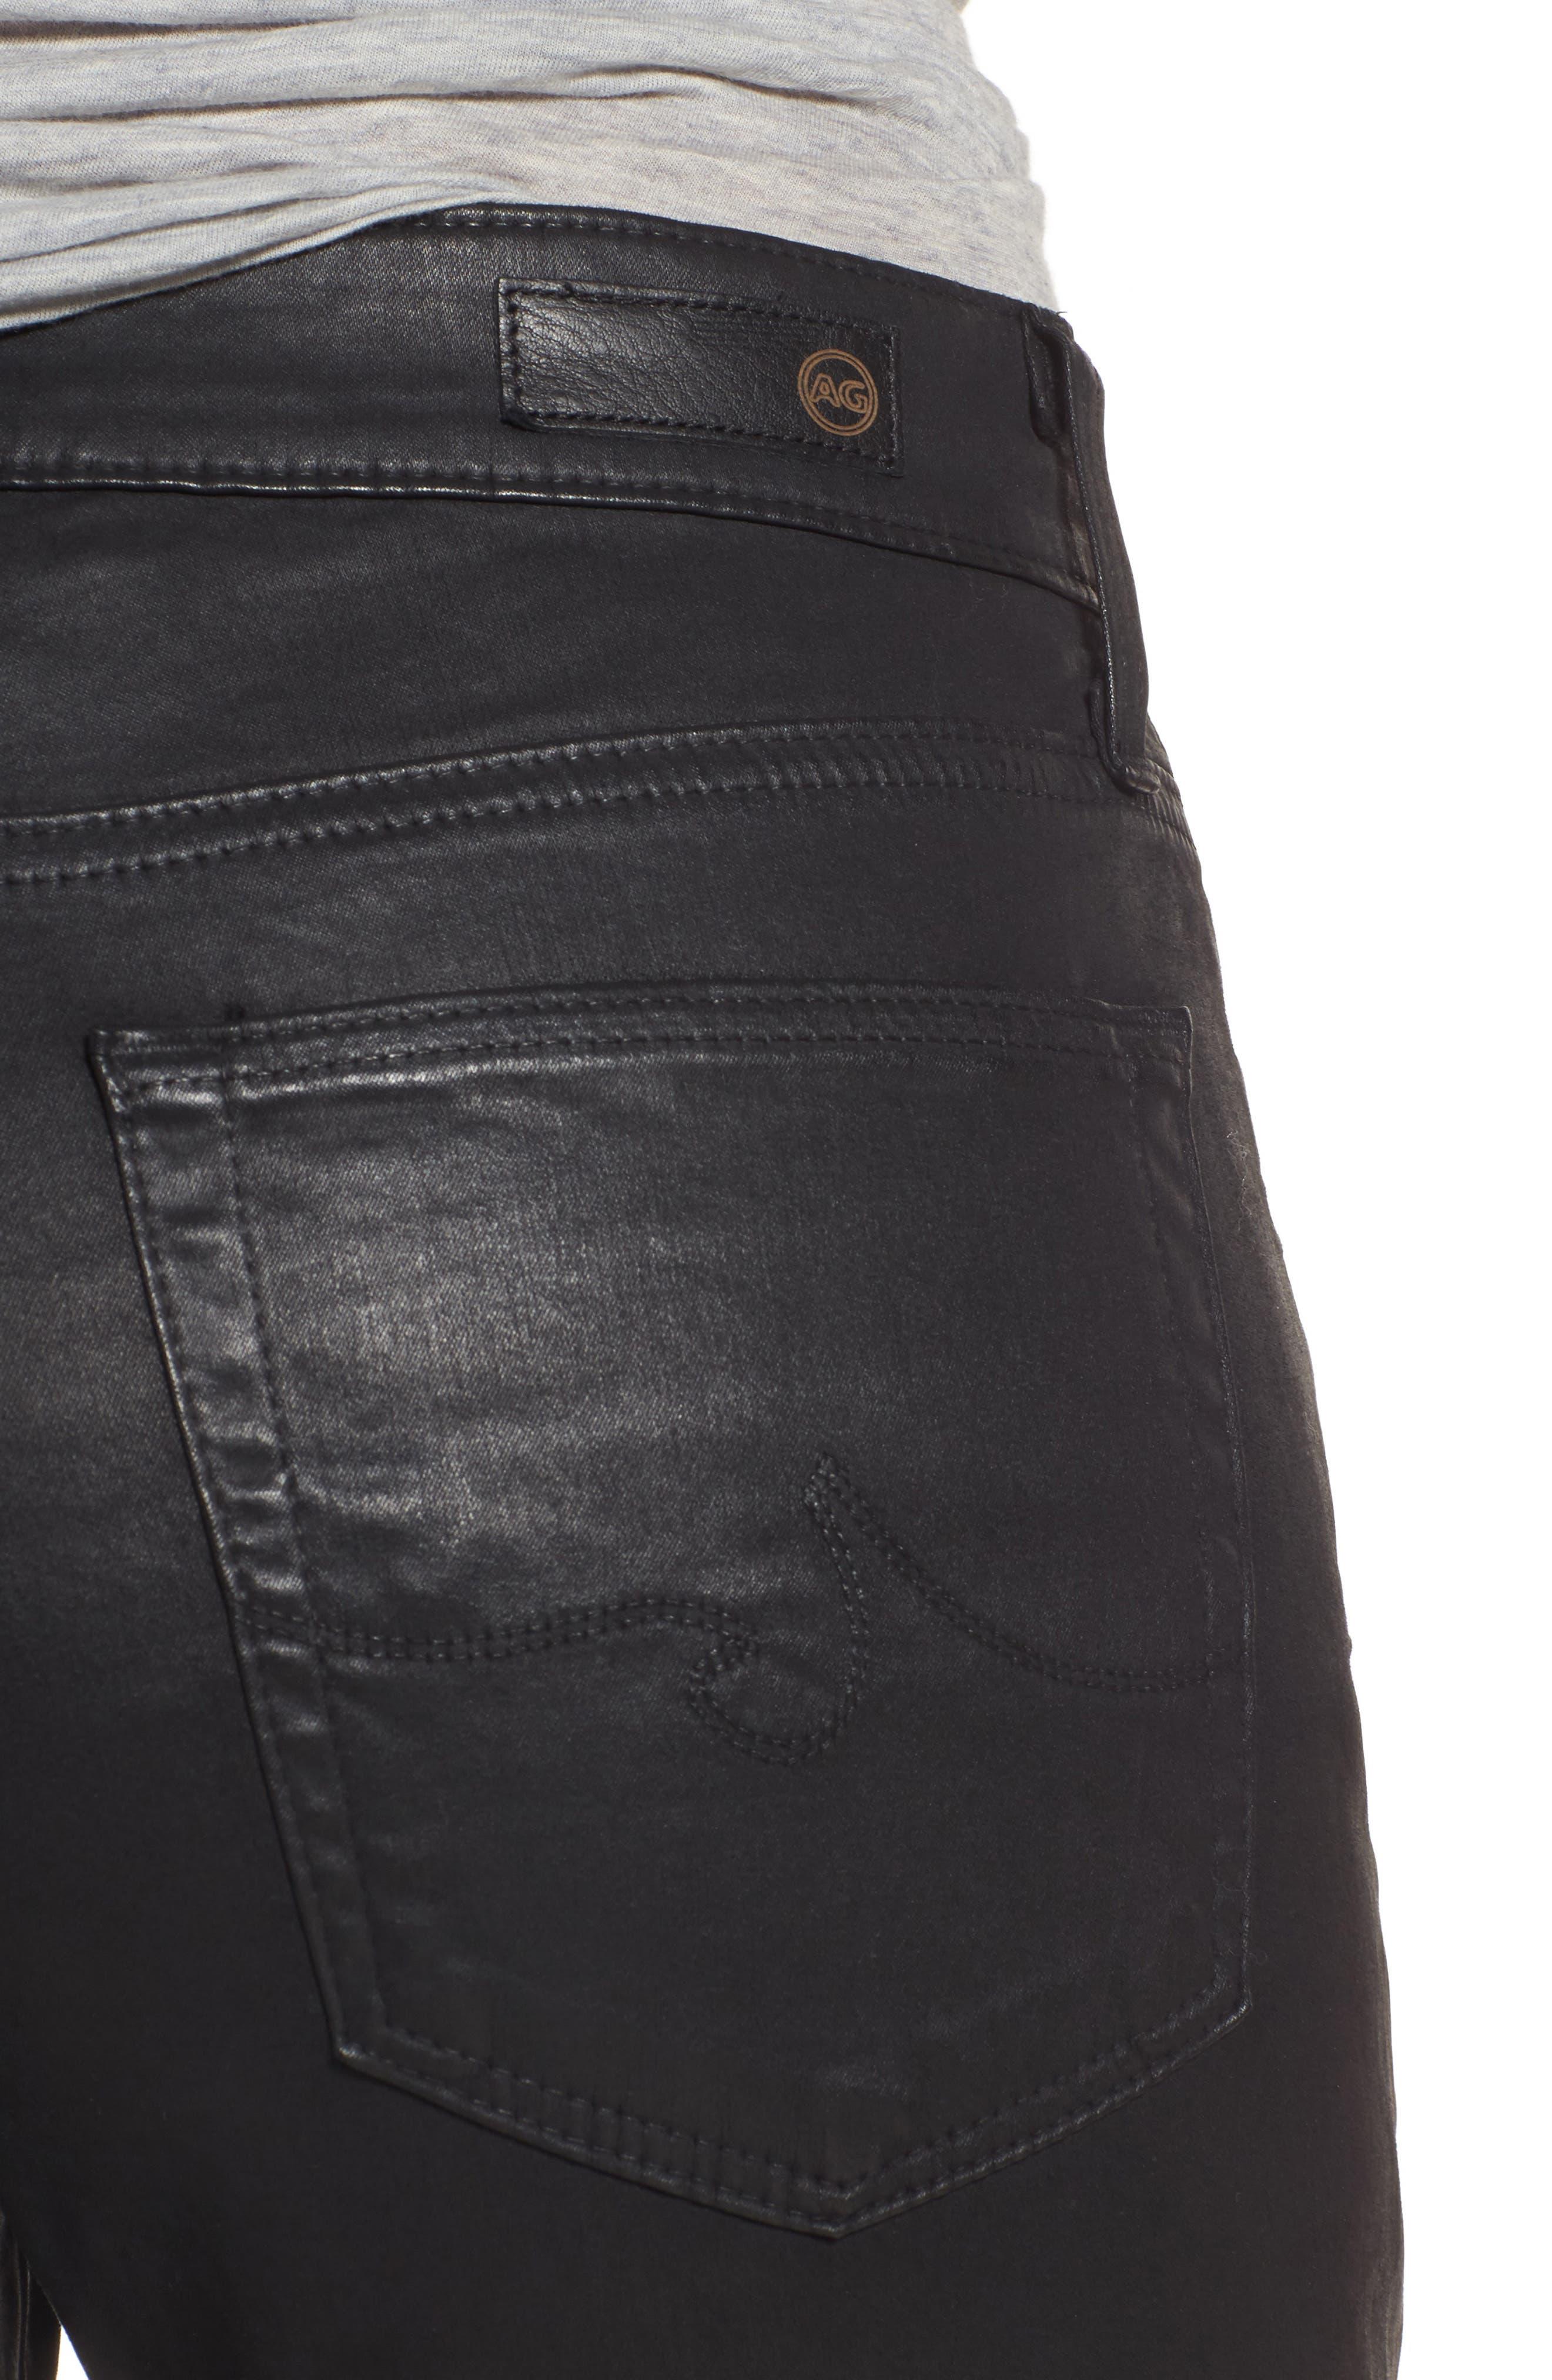 Farrah High Waist Ankle Skinny Jeans,                             Alternate thumbnail 4, color,                             Leatherette Super Black